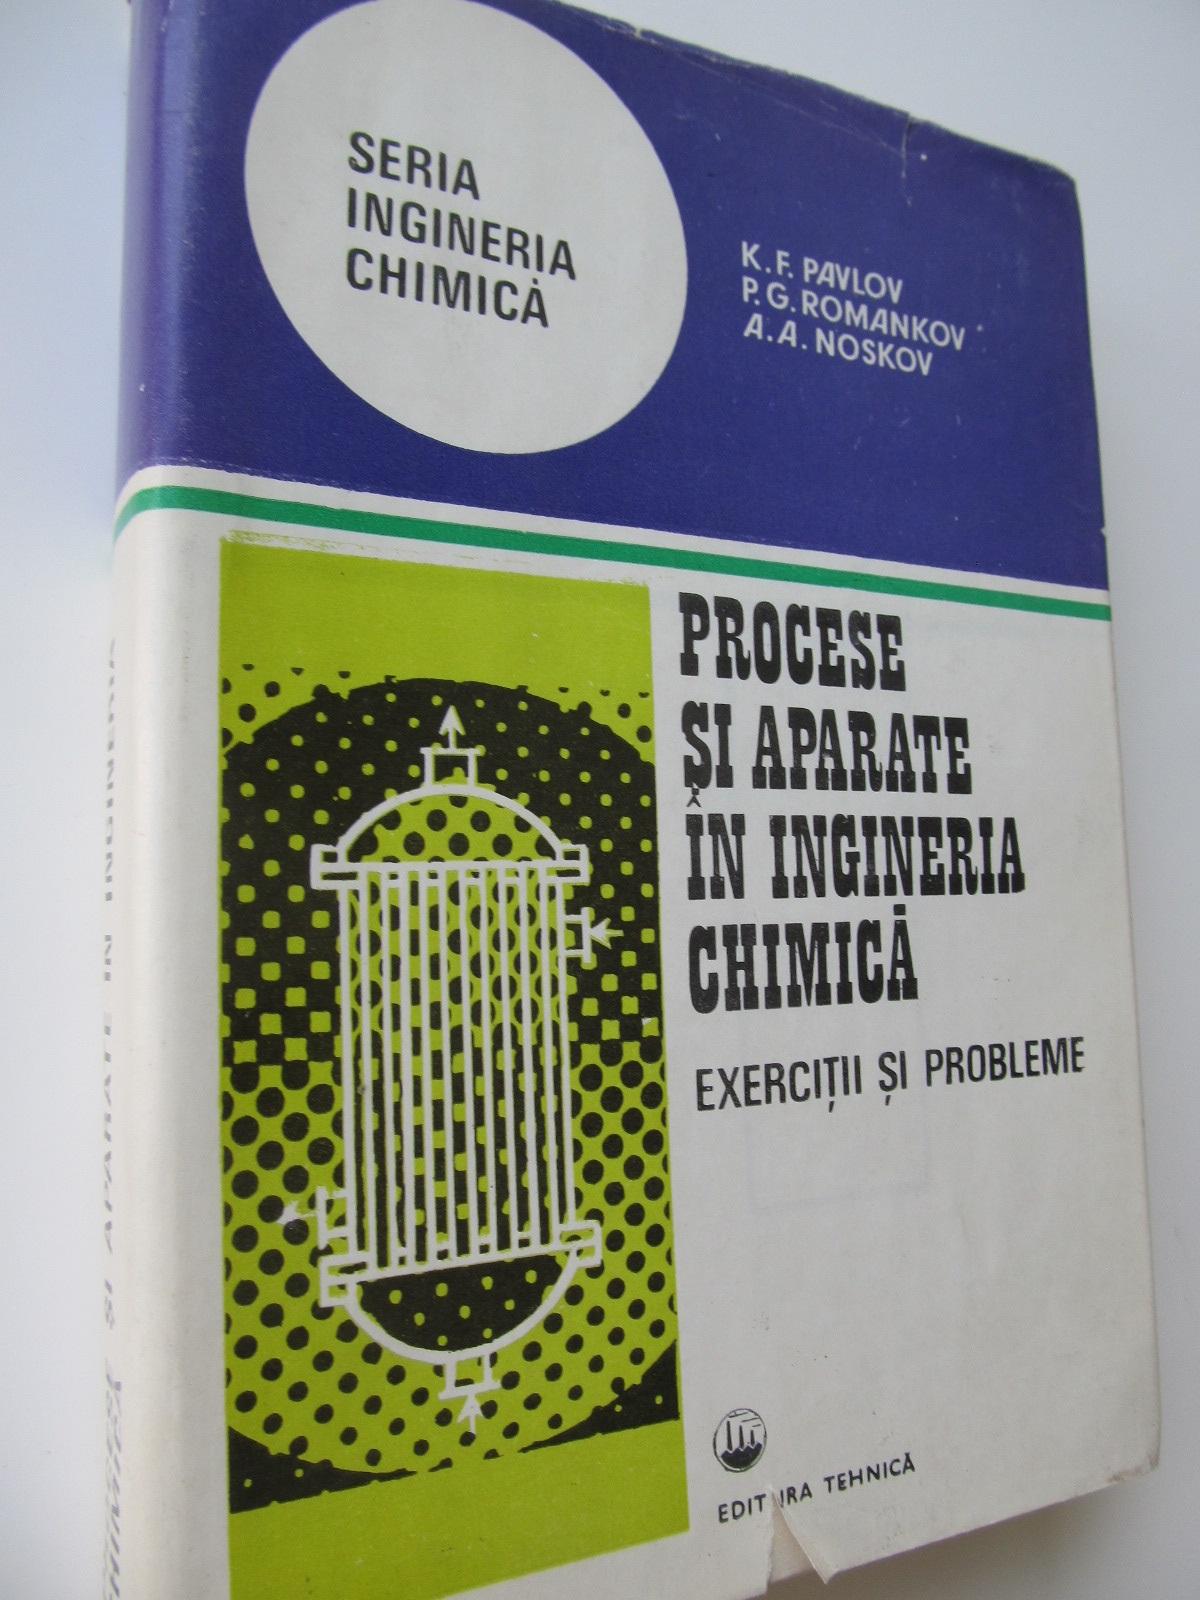 Procese si aparate in ingineria chimica - Exercitii si probleme - K. F. Pavlov , P. G. Romankov , A. A. Noskov | Detalii carte